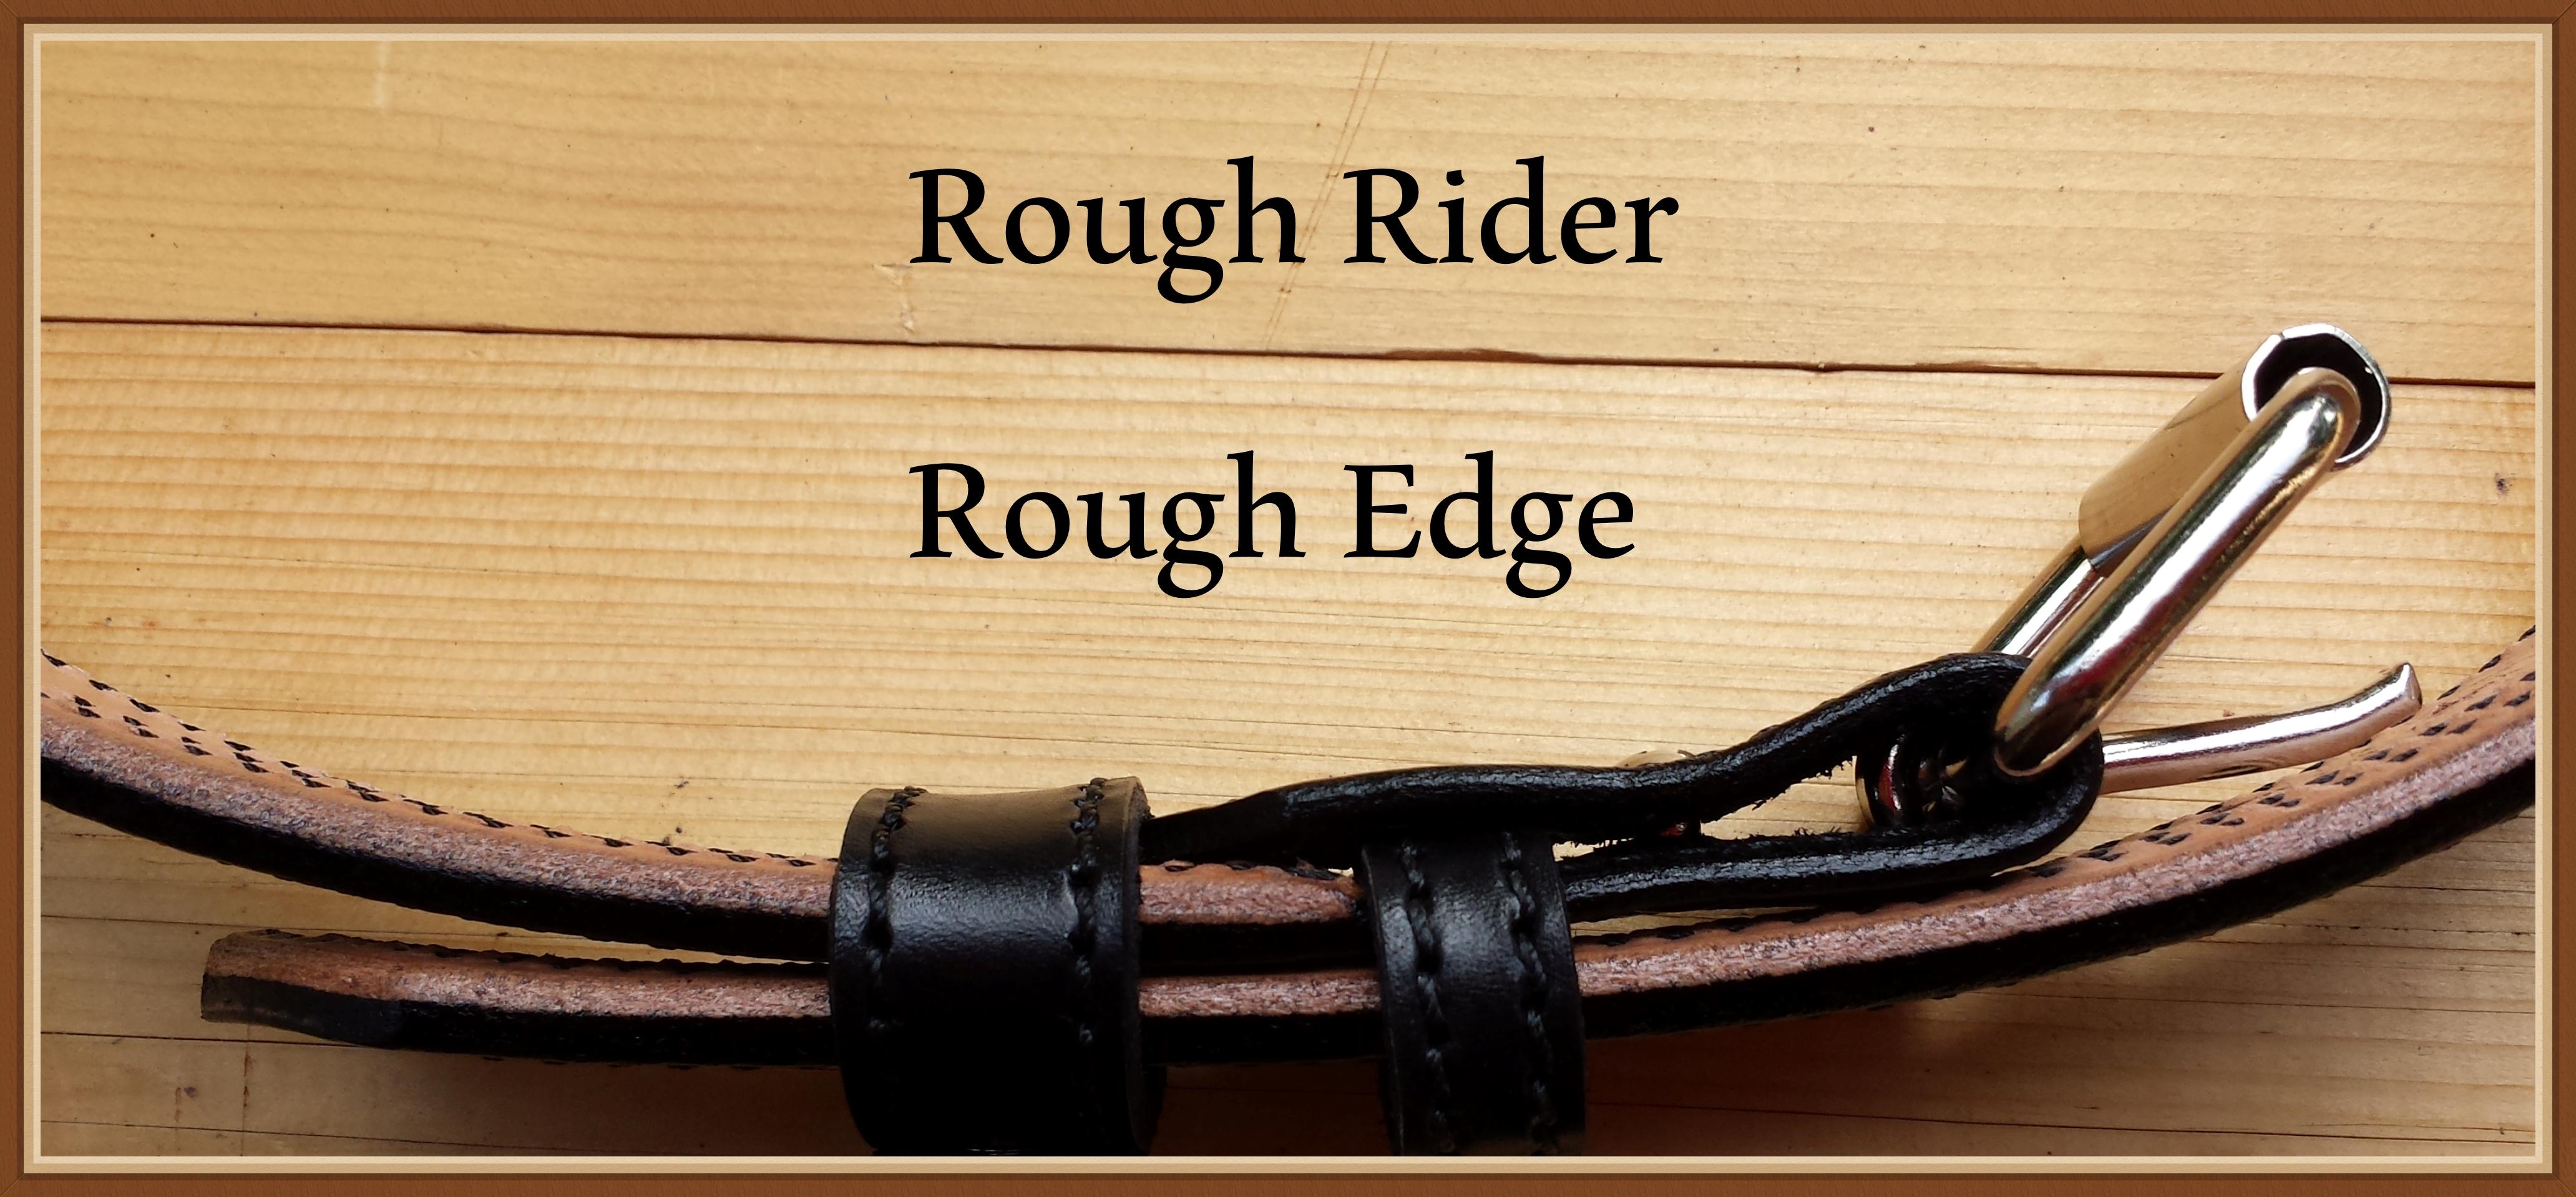 roughrideredge.jpg